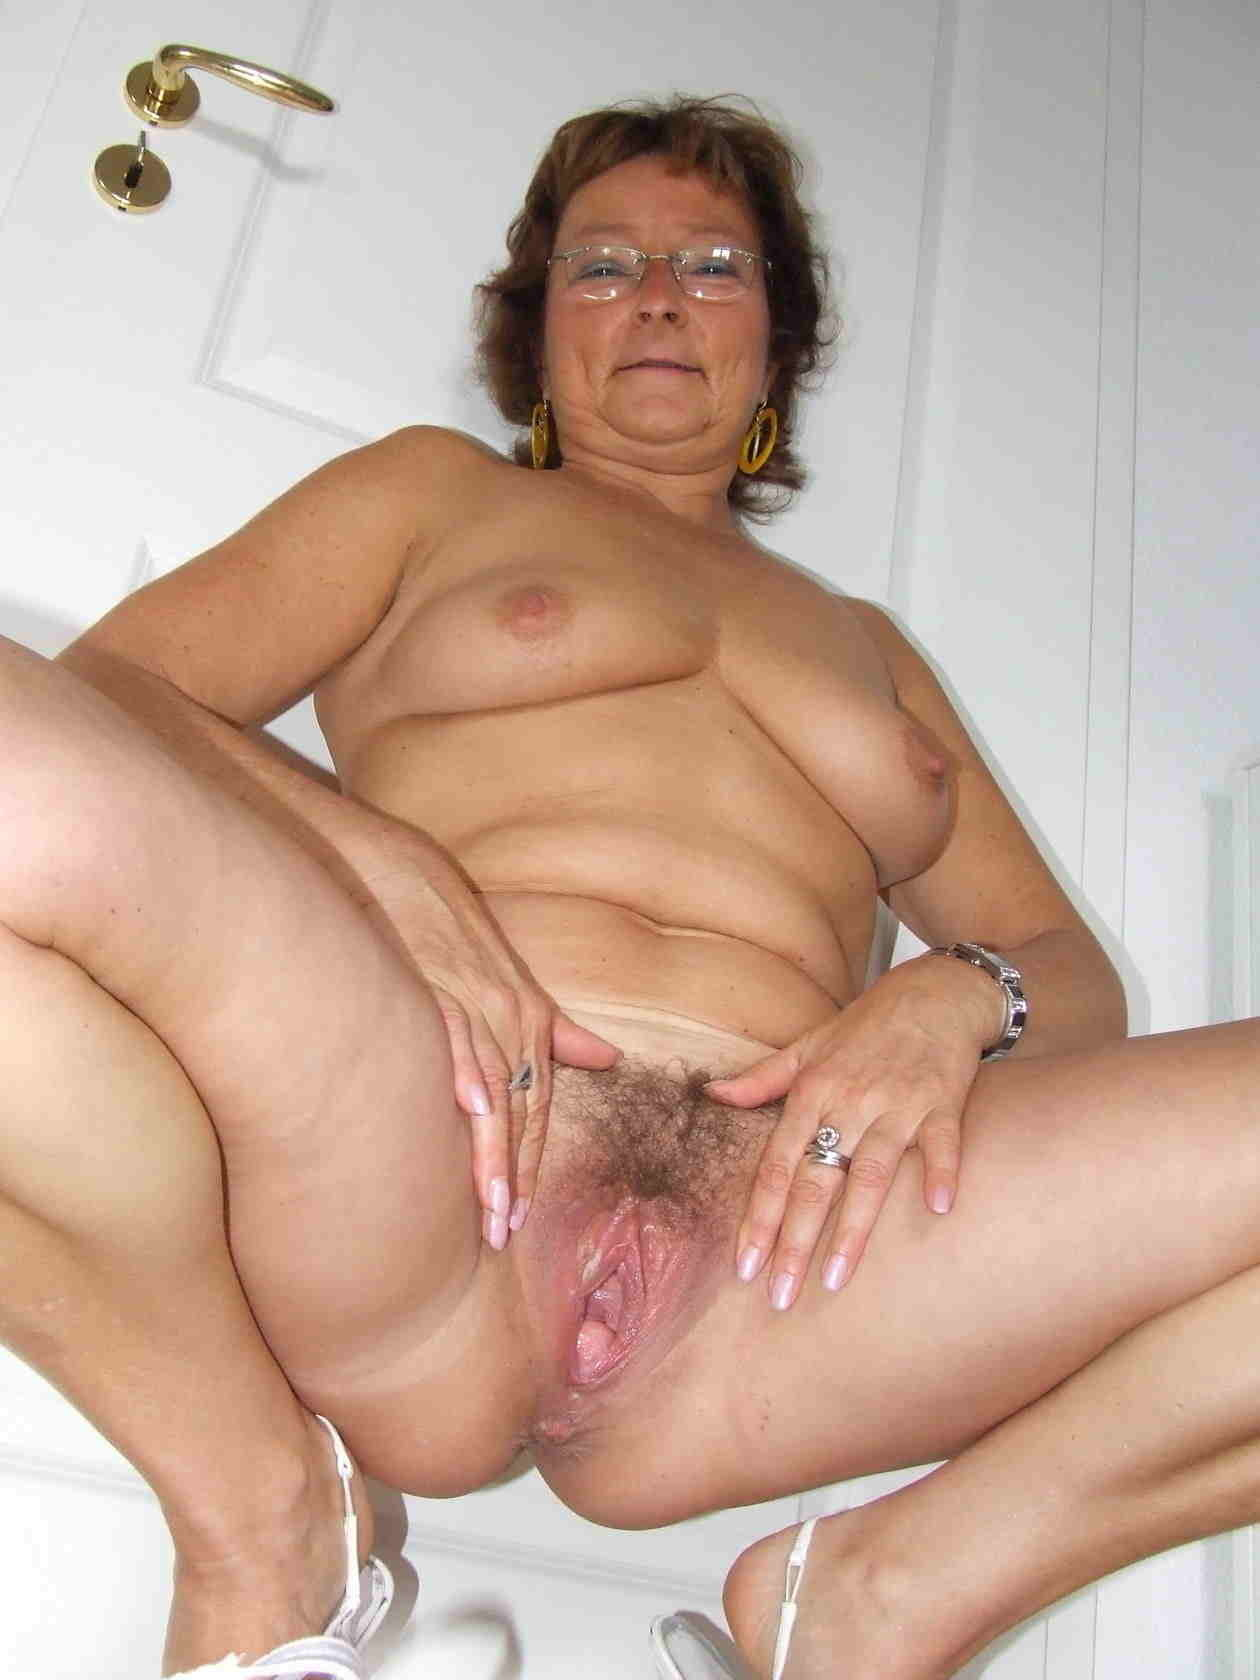 Pics grandma pussy Grandma Nude